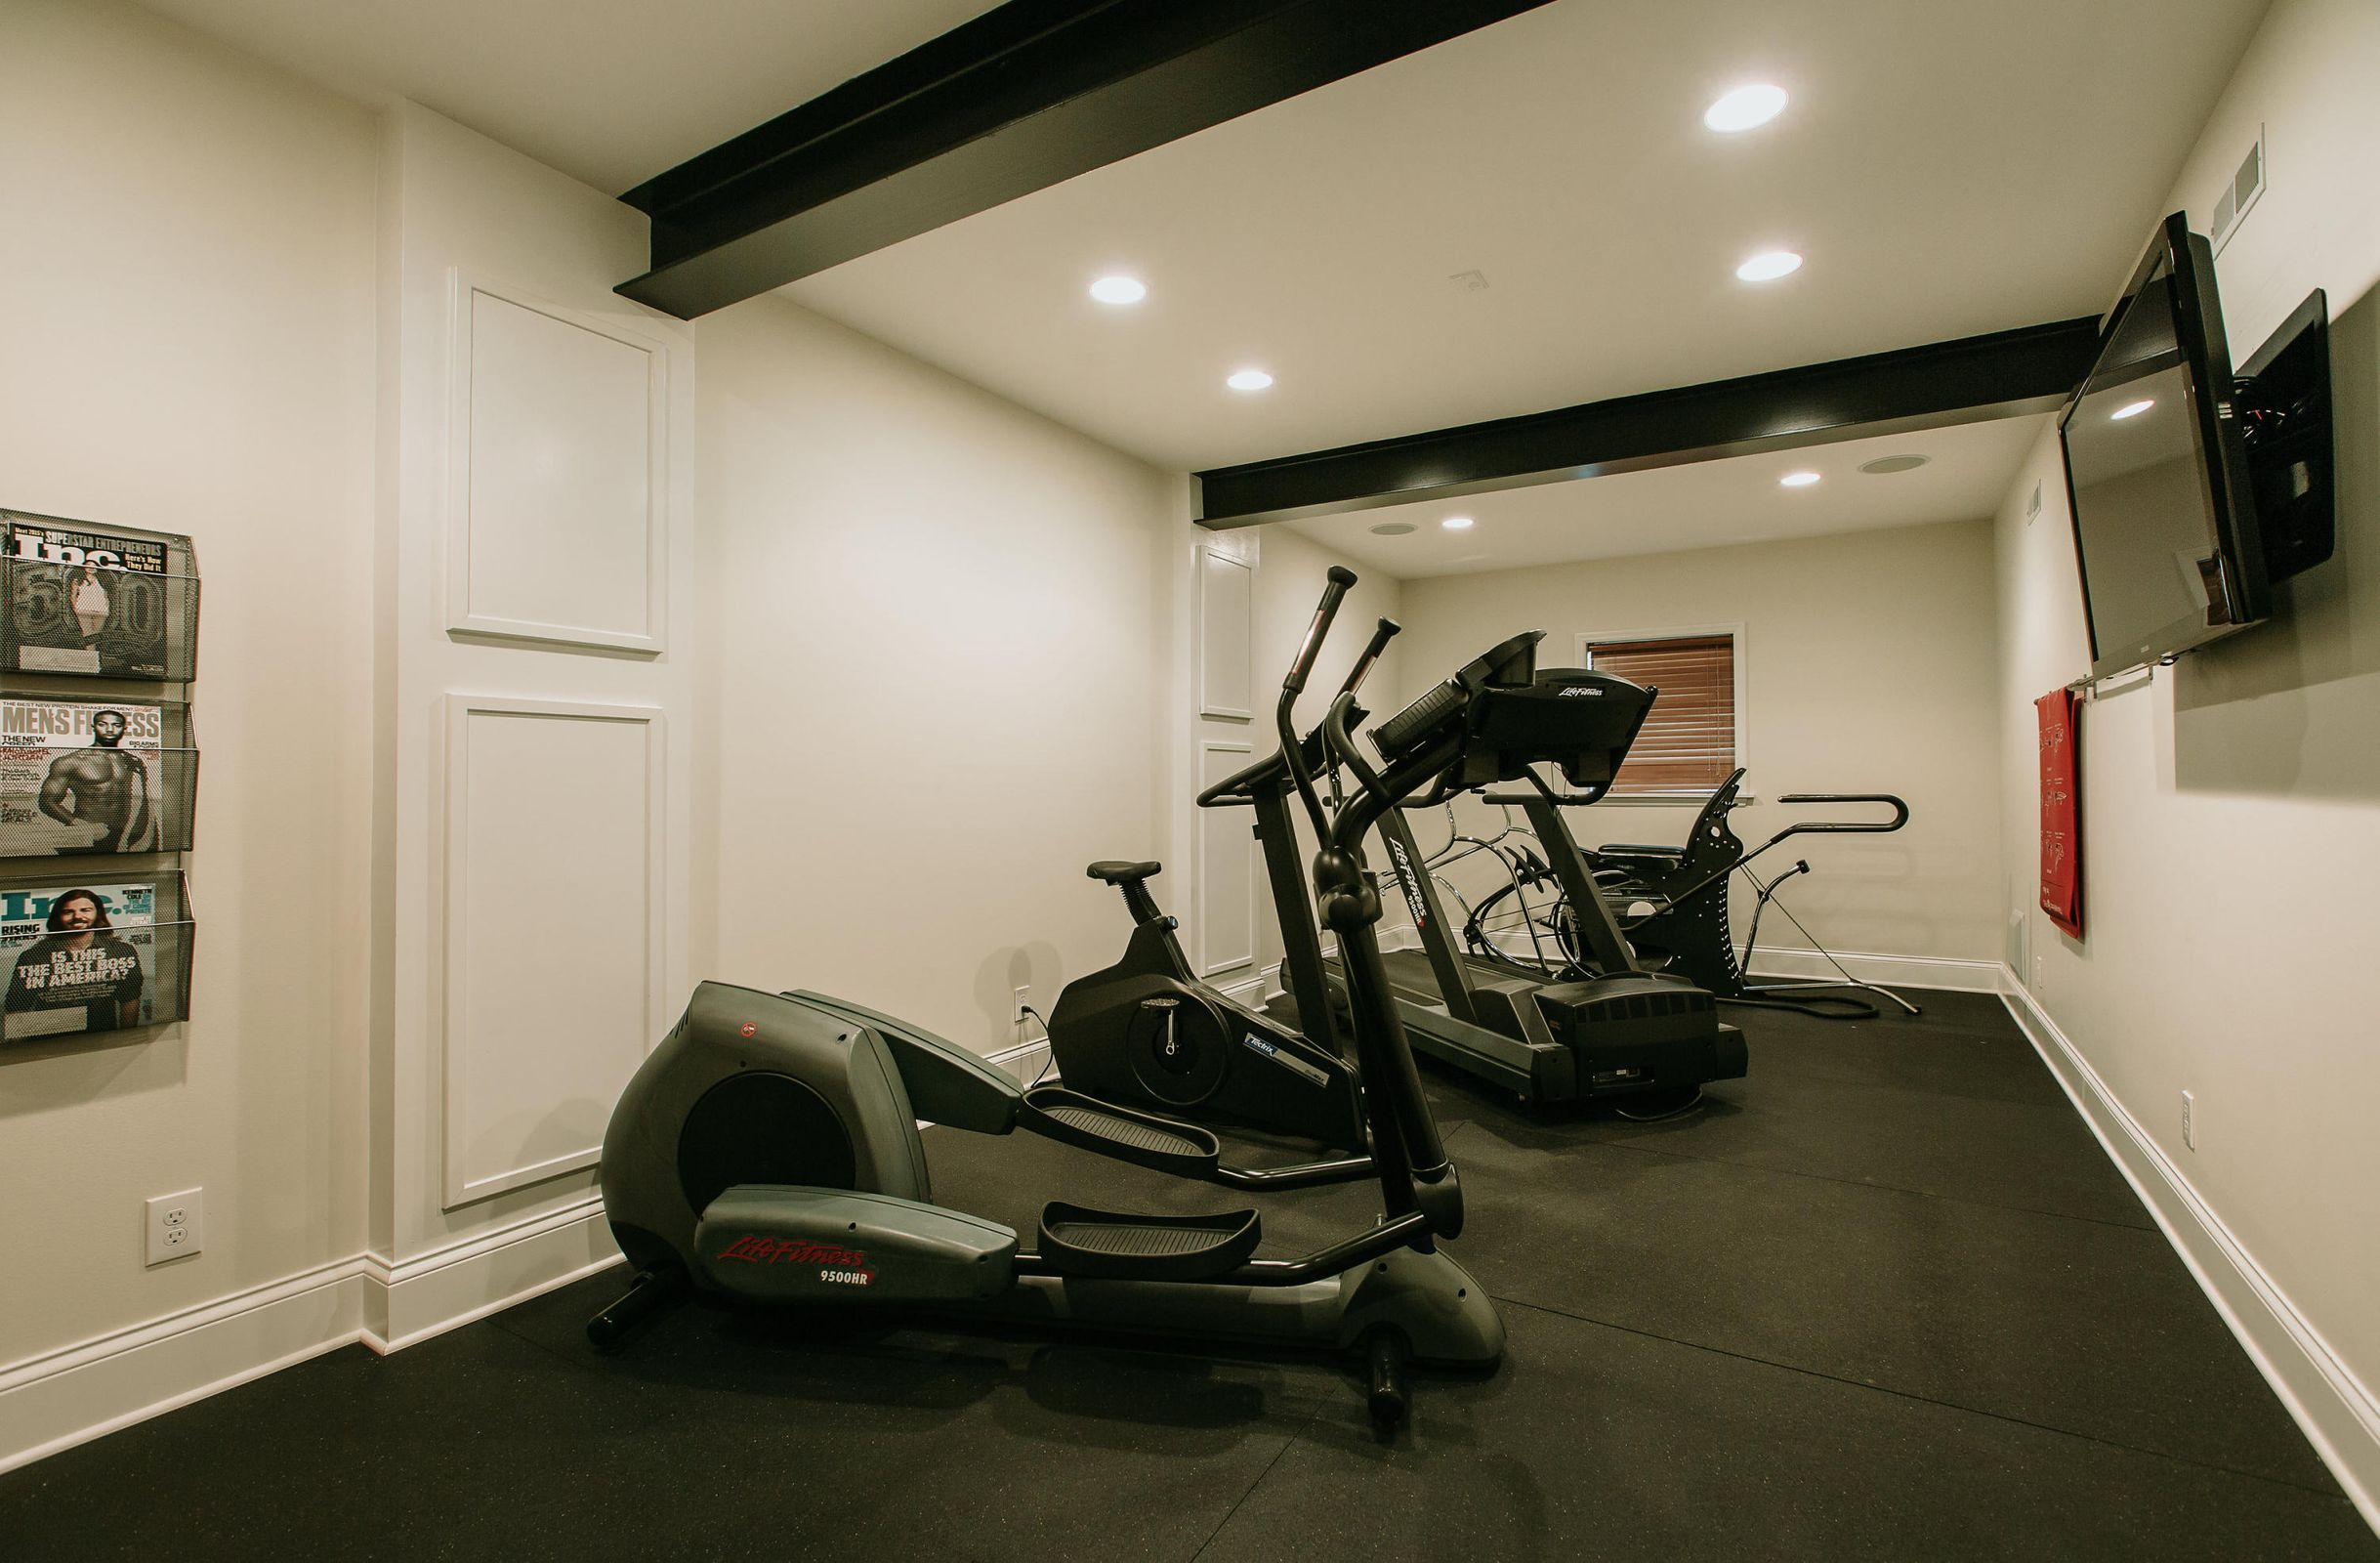 13fitnessroom-bedroom